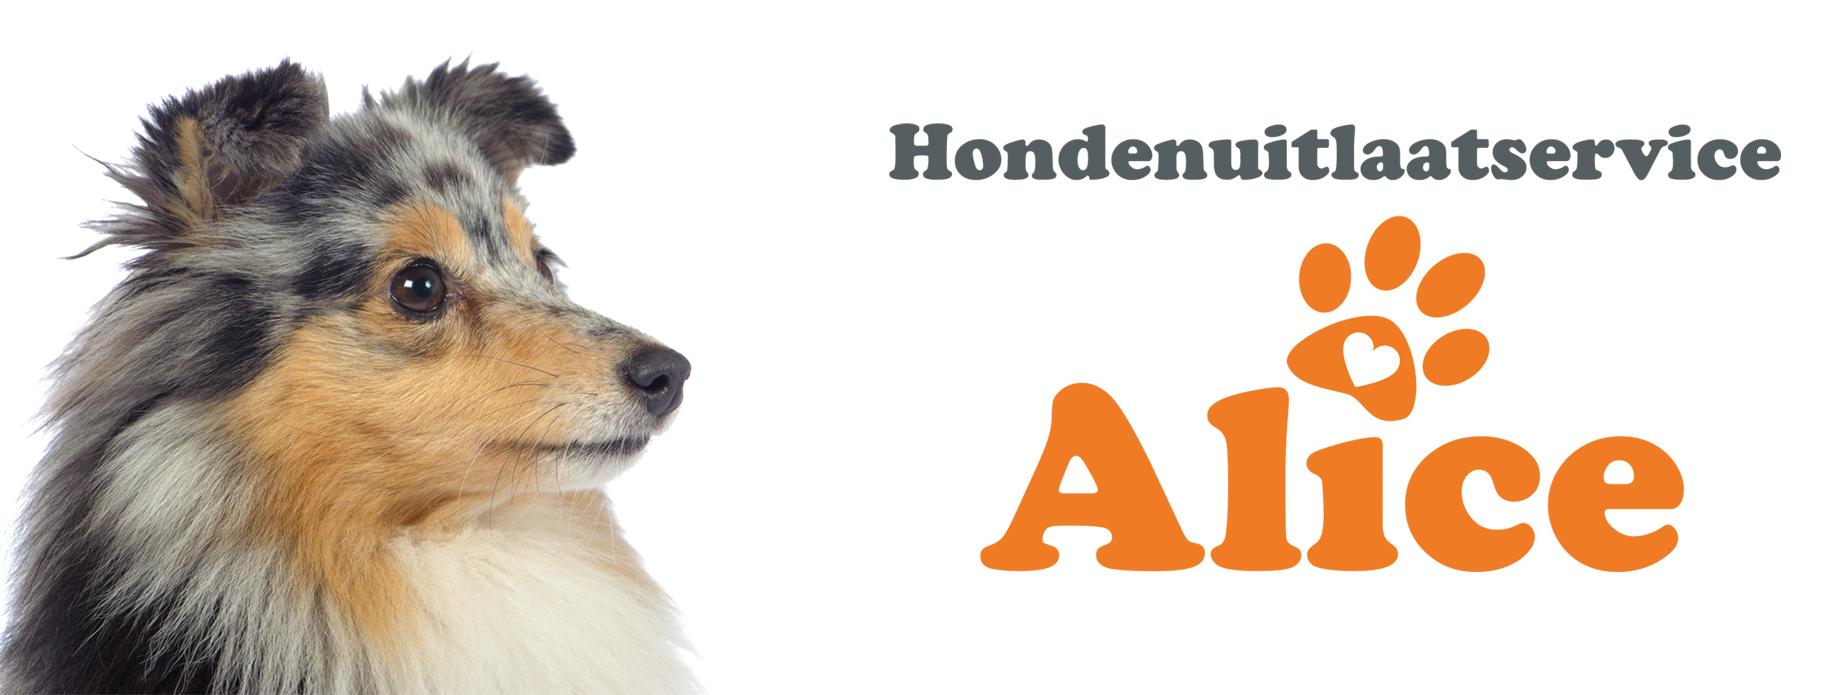 Hondenuitlaatservice Alice